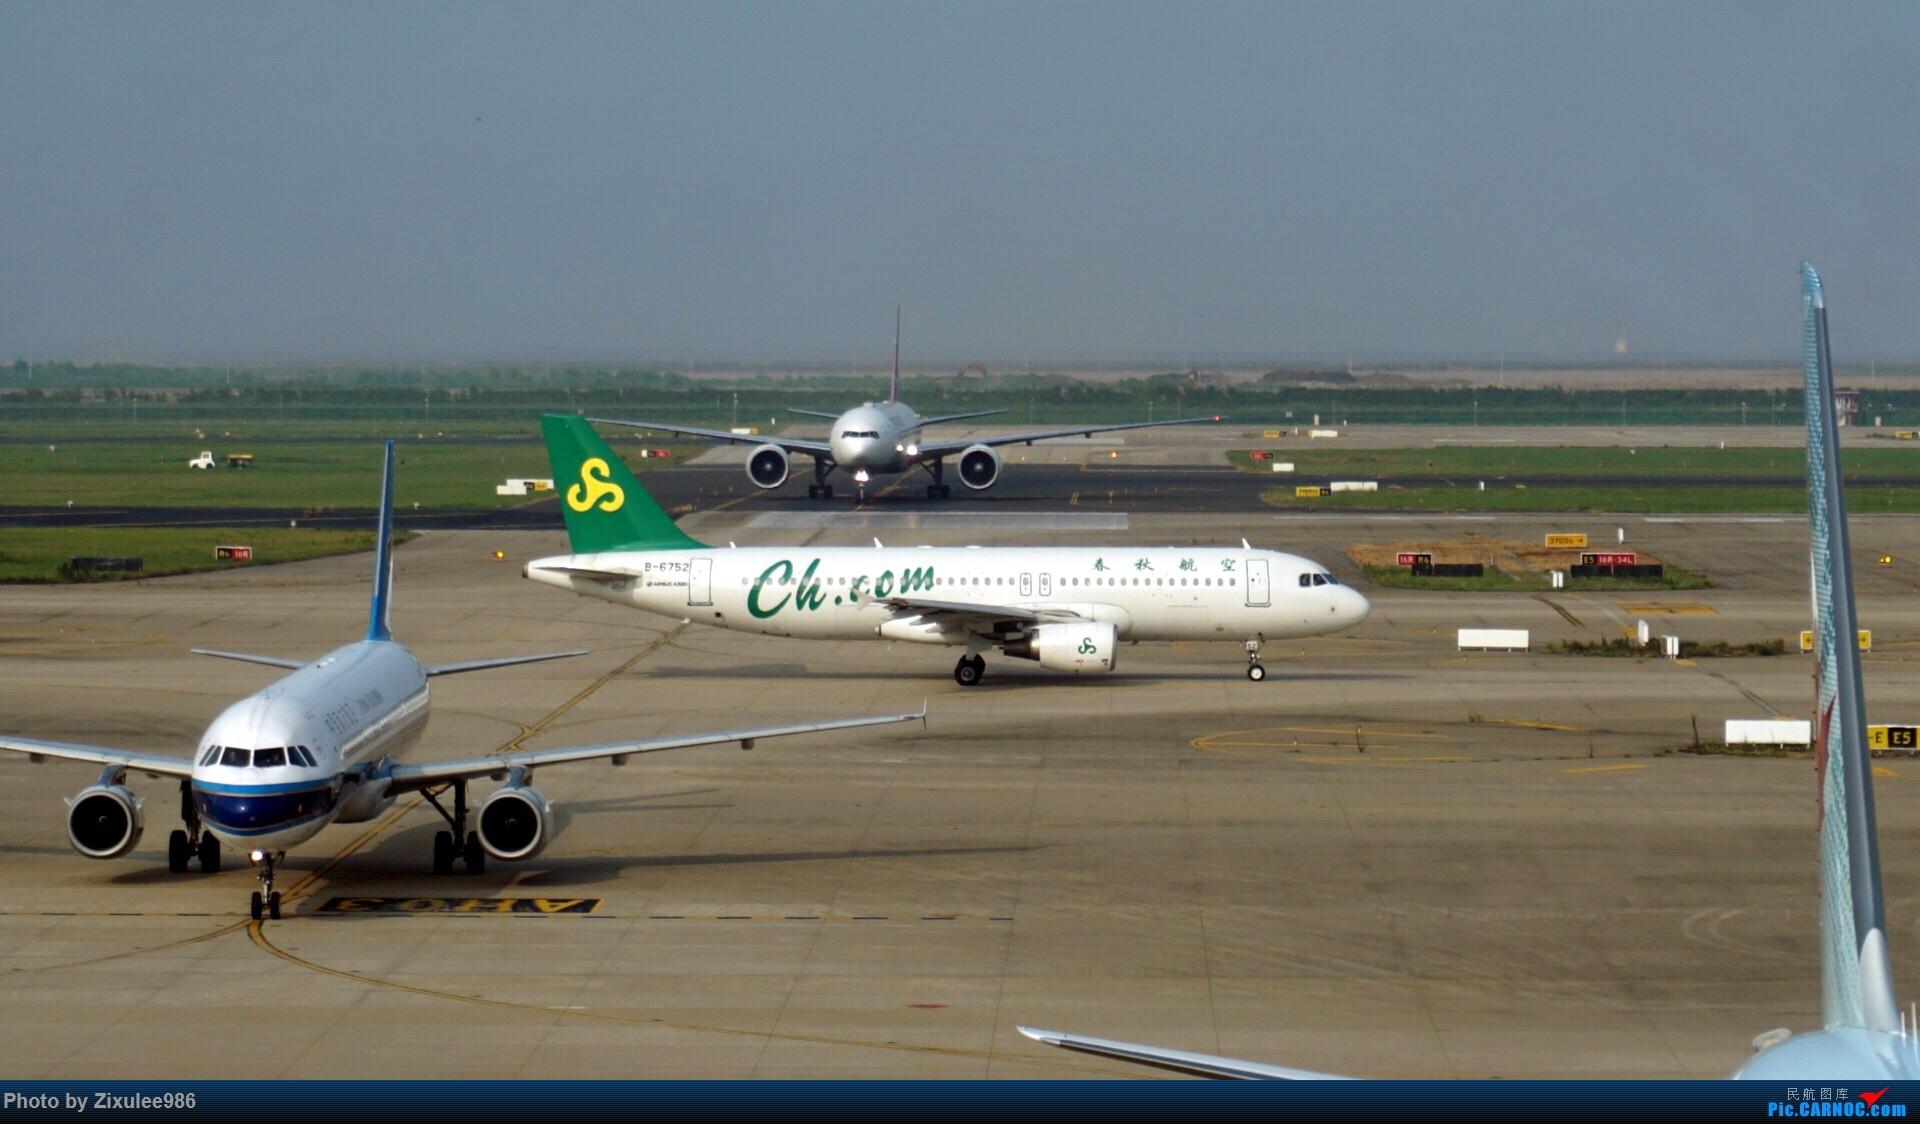 Re:[原创]加拿大21日游学之旅(一)~JJN-PVG-YYZ..(内含flightlog)~第一次发游记~多图缓更请谅解 AIRBUS A320-200 B-6752 中国上海浦东国际机场